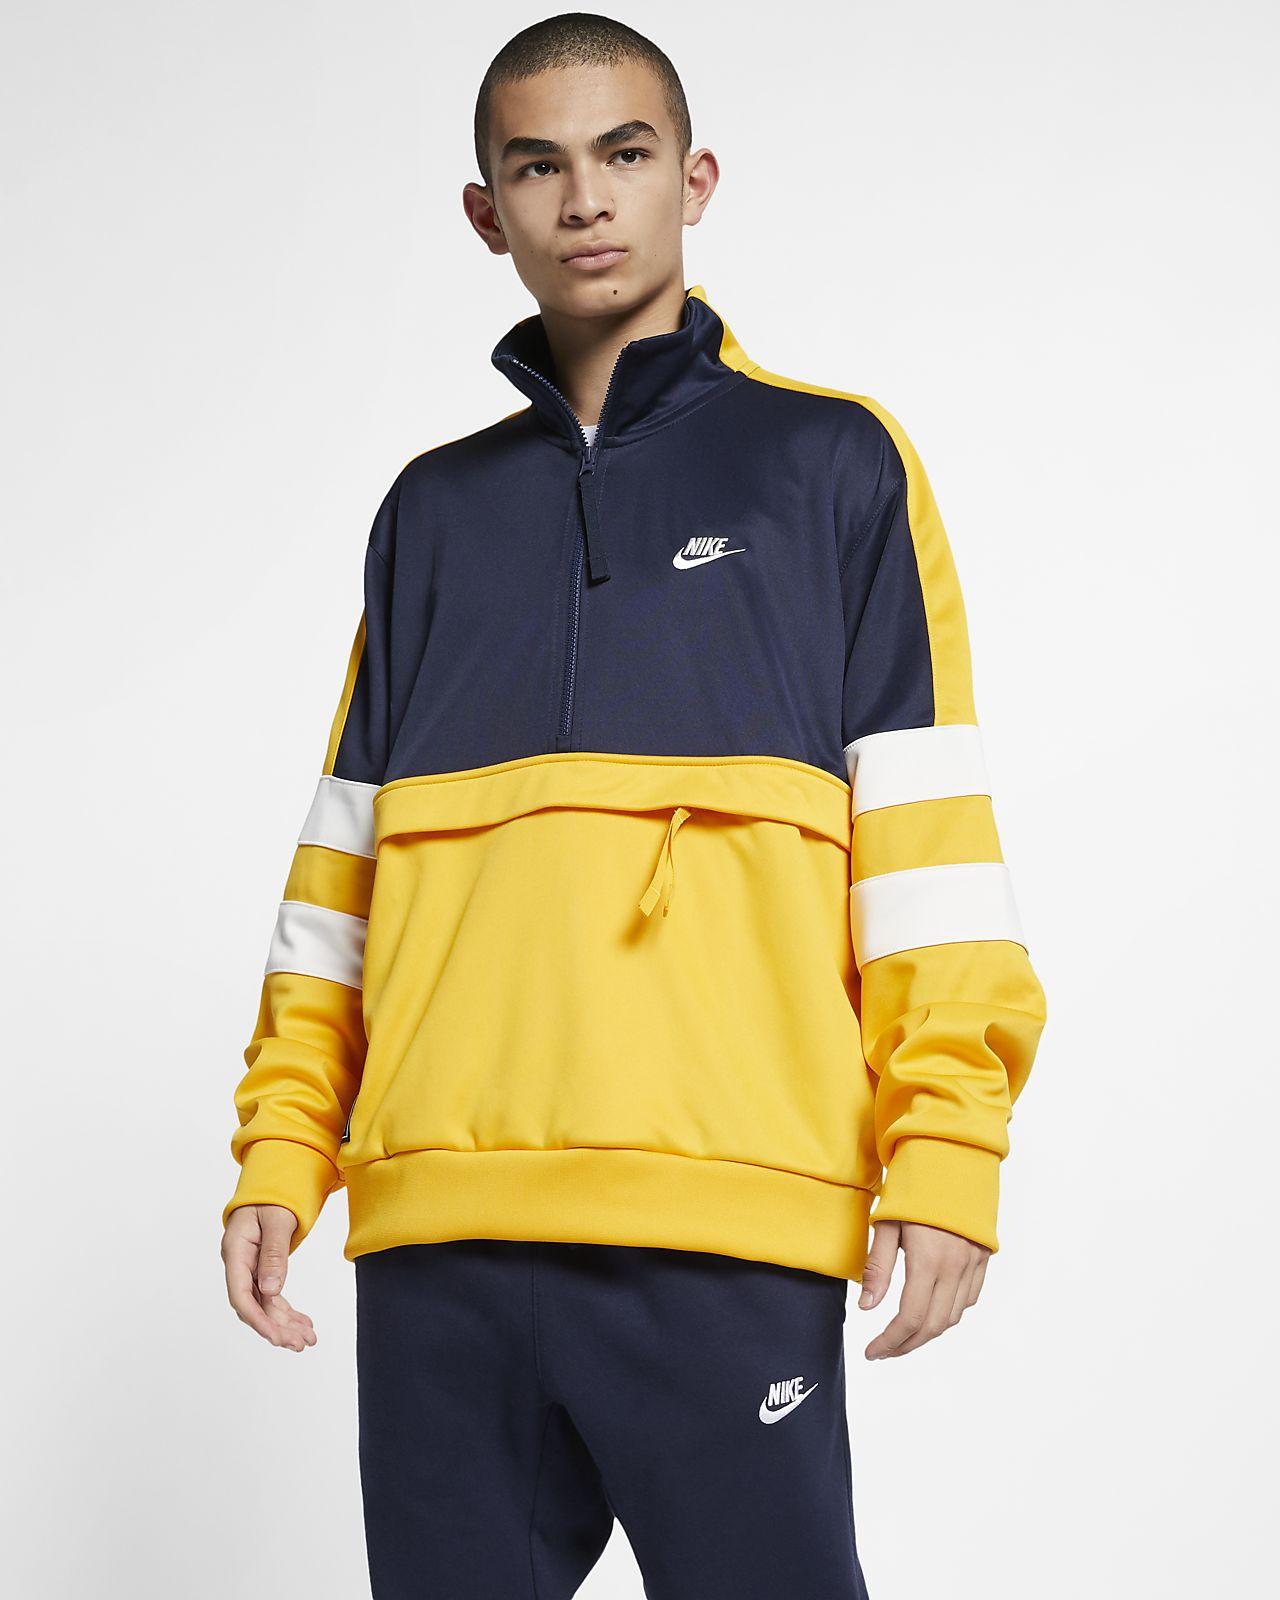 Nike Air Jacket